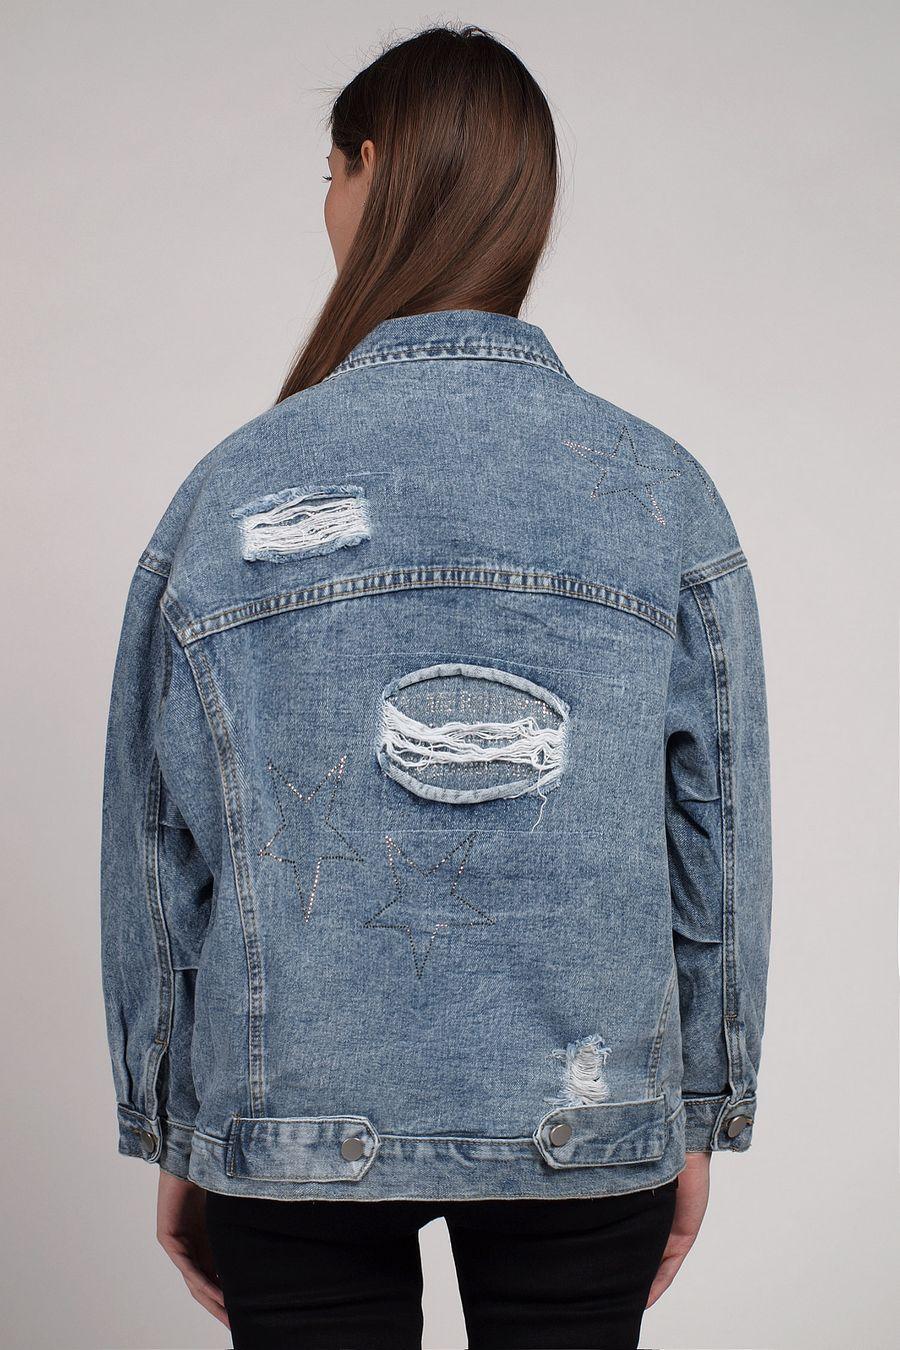 Жакет женский (джинсовка) LRZBS 2059 - фото 3